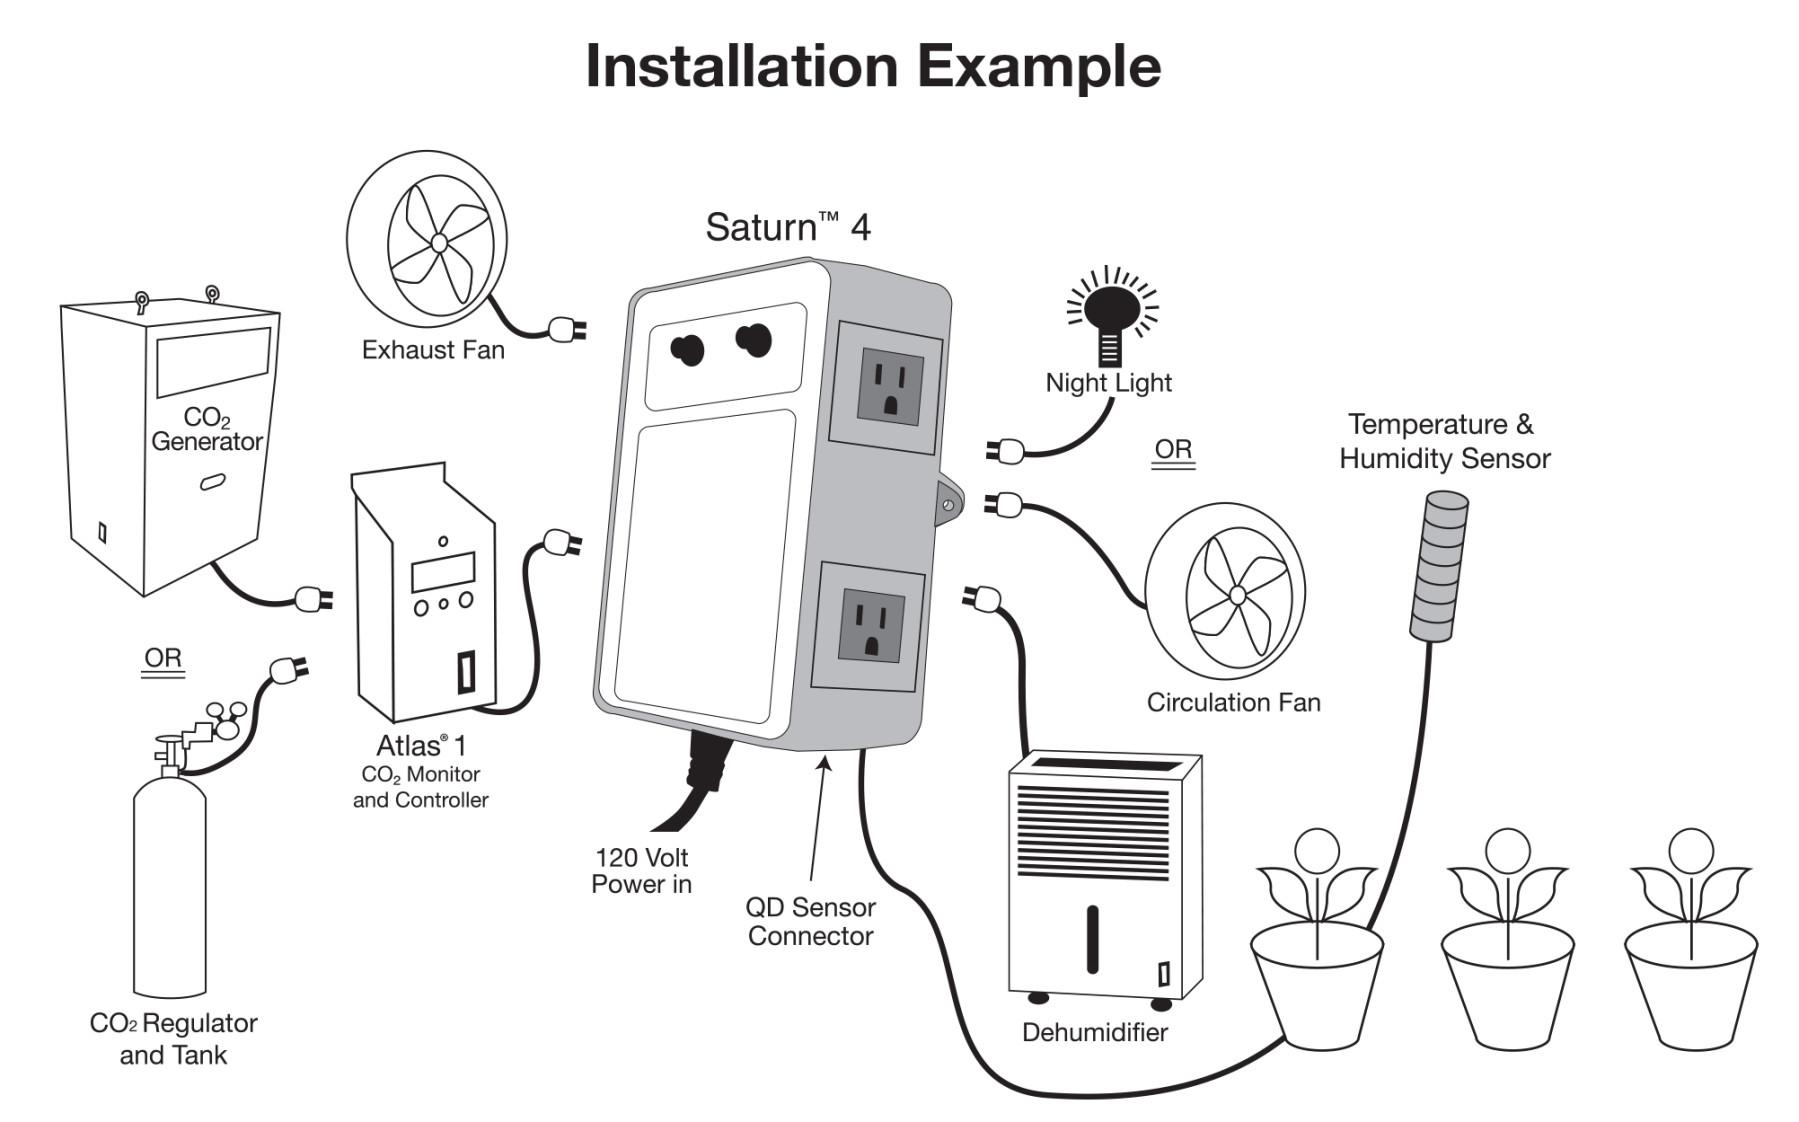 Titan Controls Saturn 4: Digital Grow Room Environmental